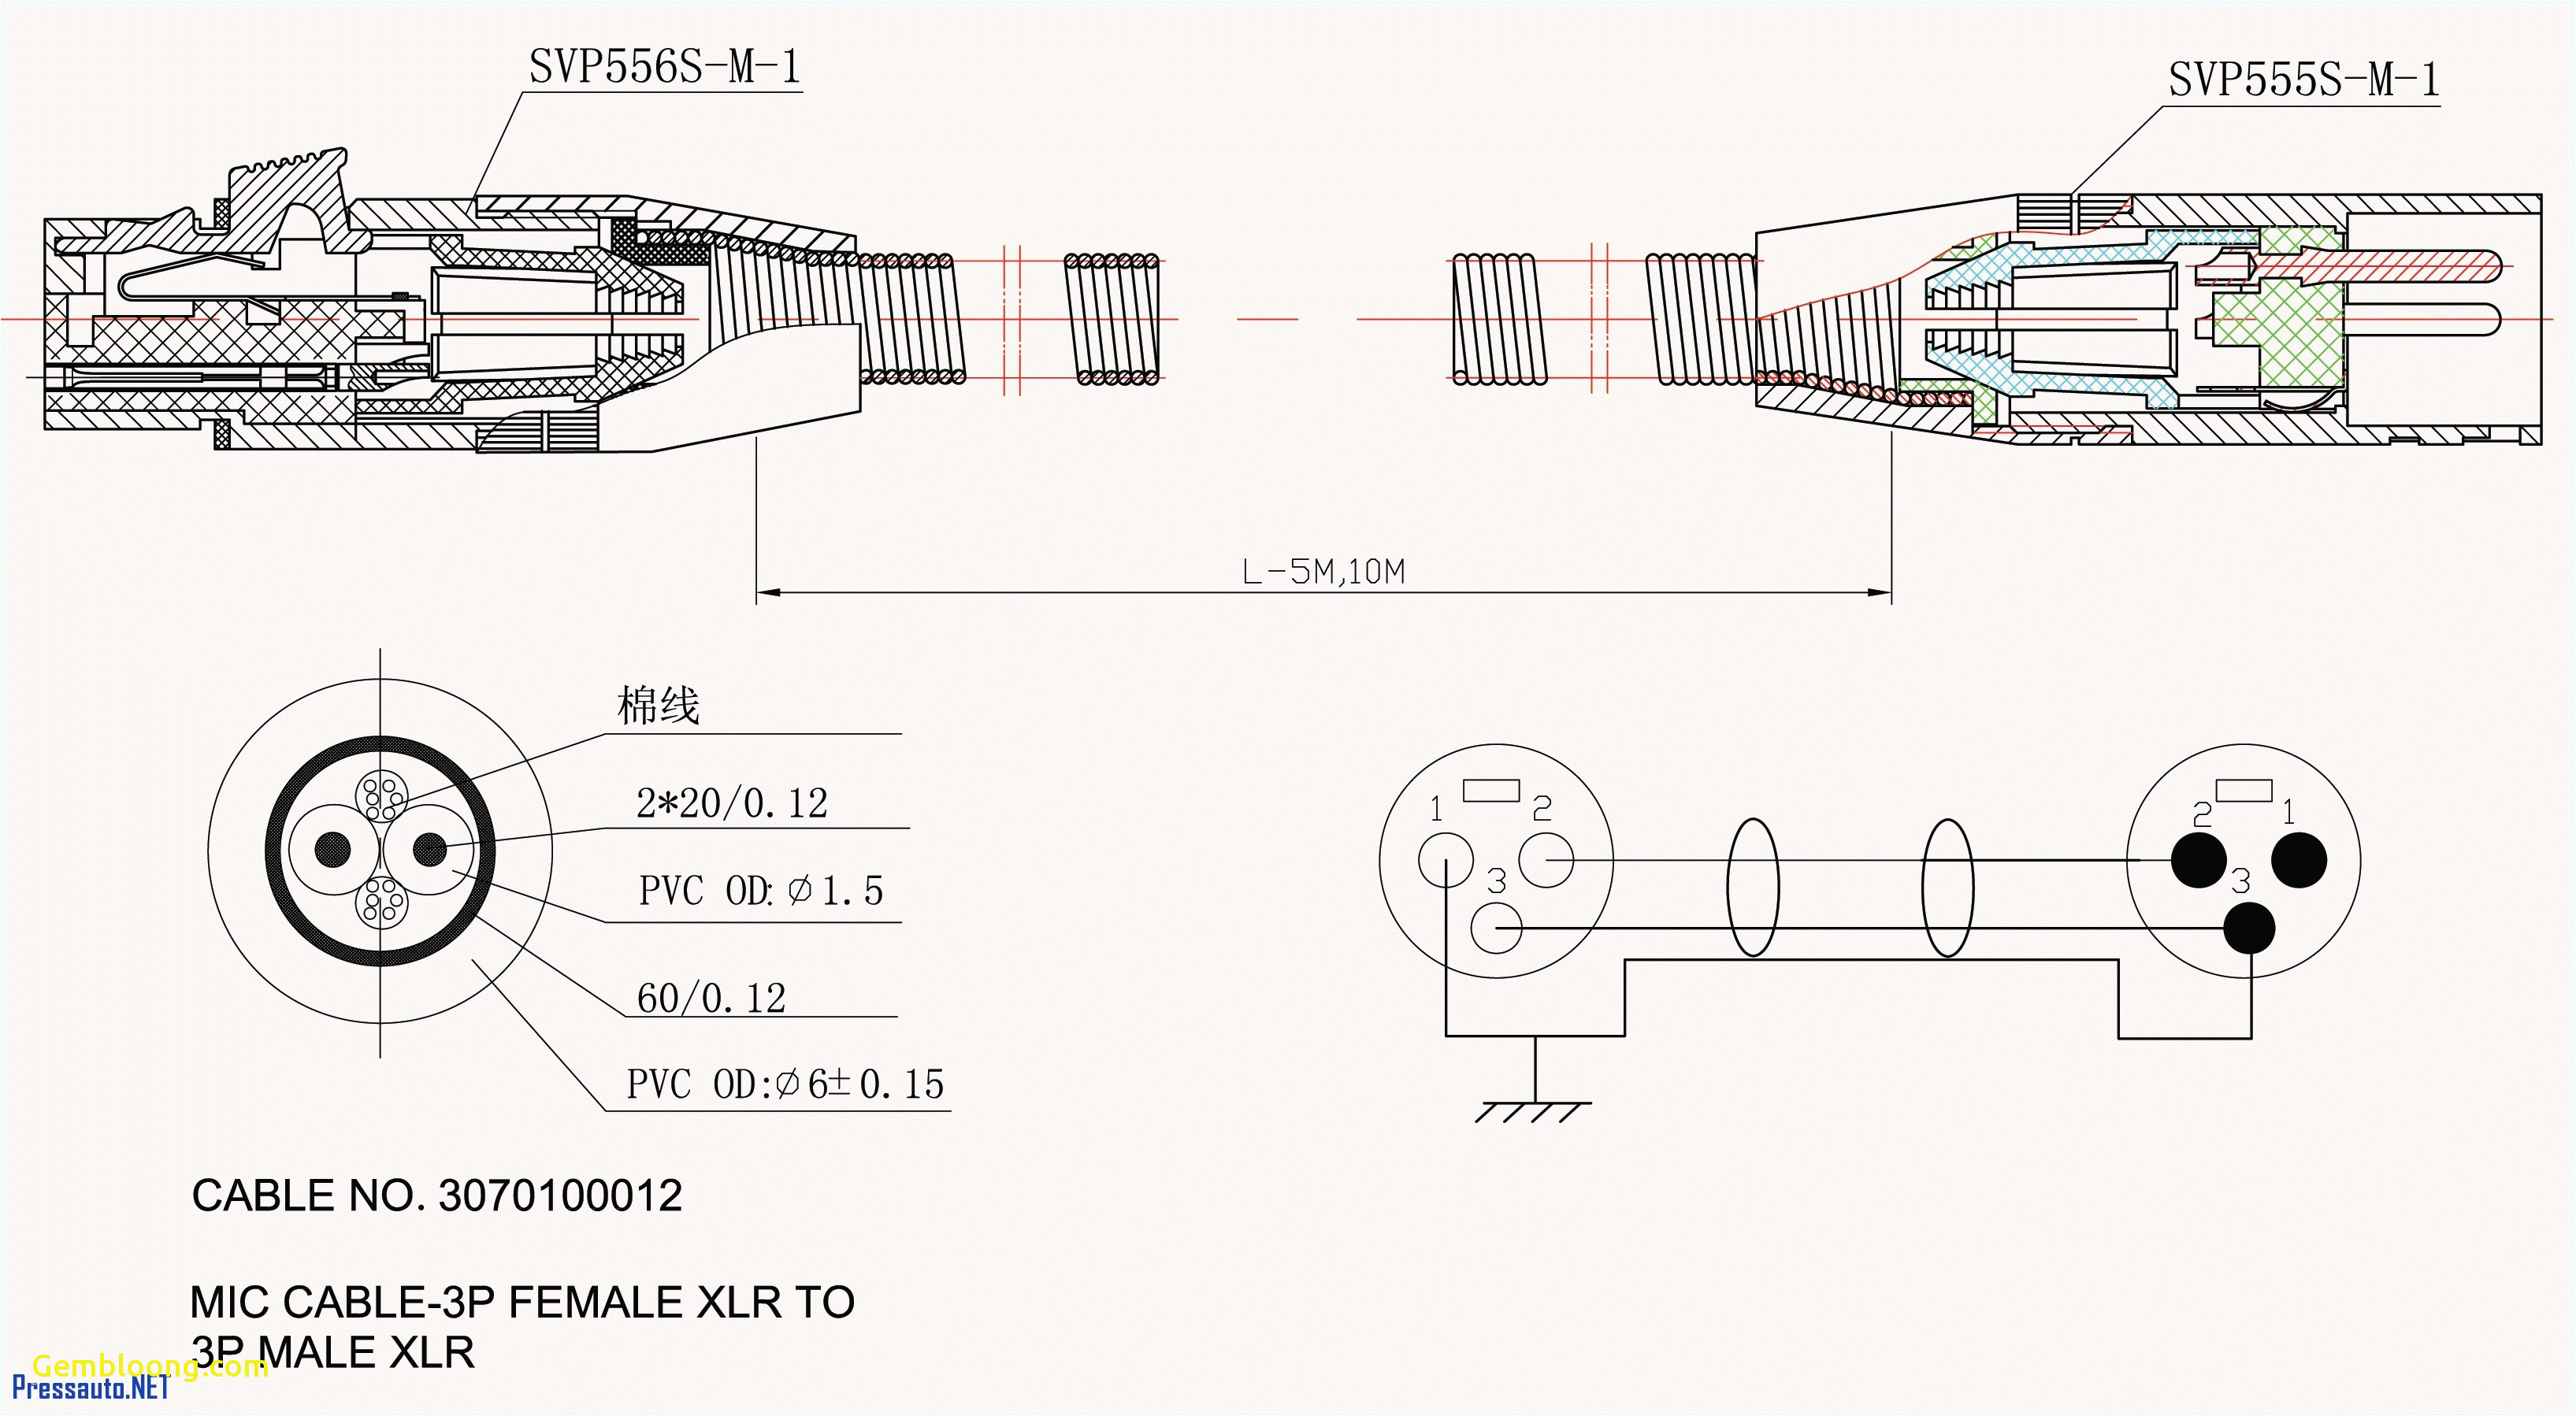 2000 2 5rs wiring diagram wiring diagram repair guides 2000 2 5rs wiring diagram